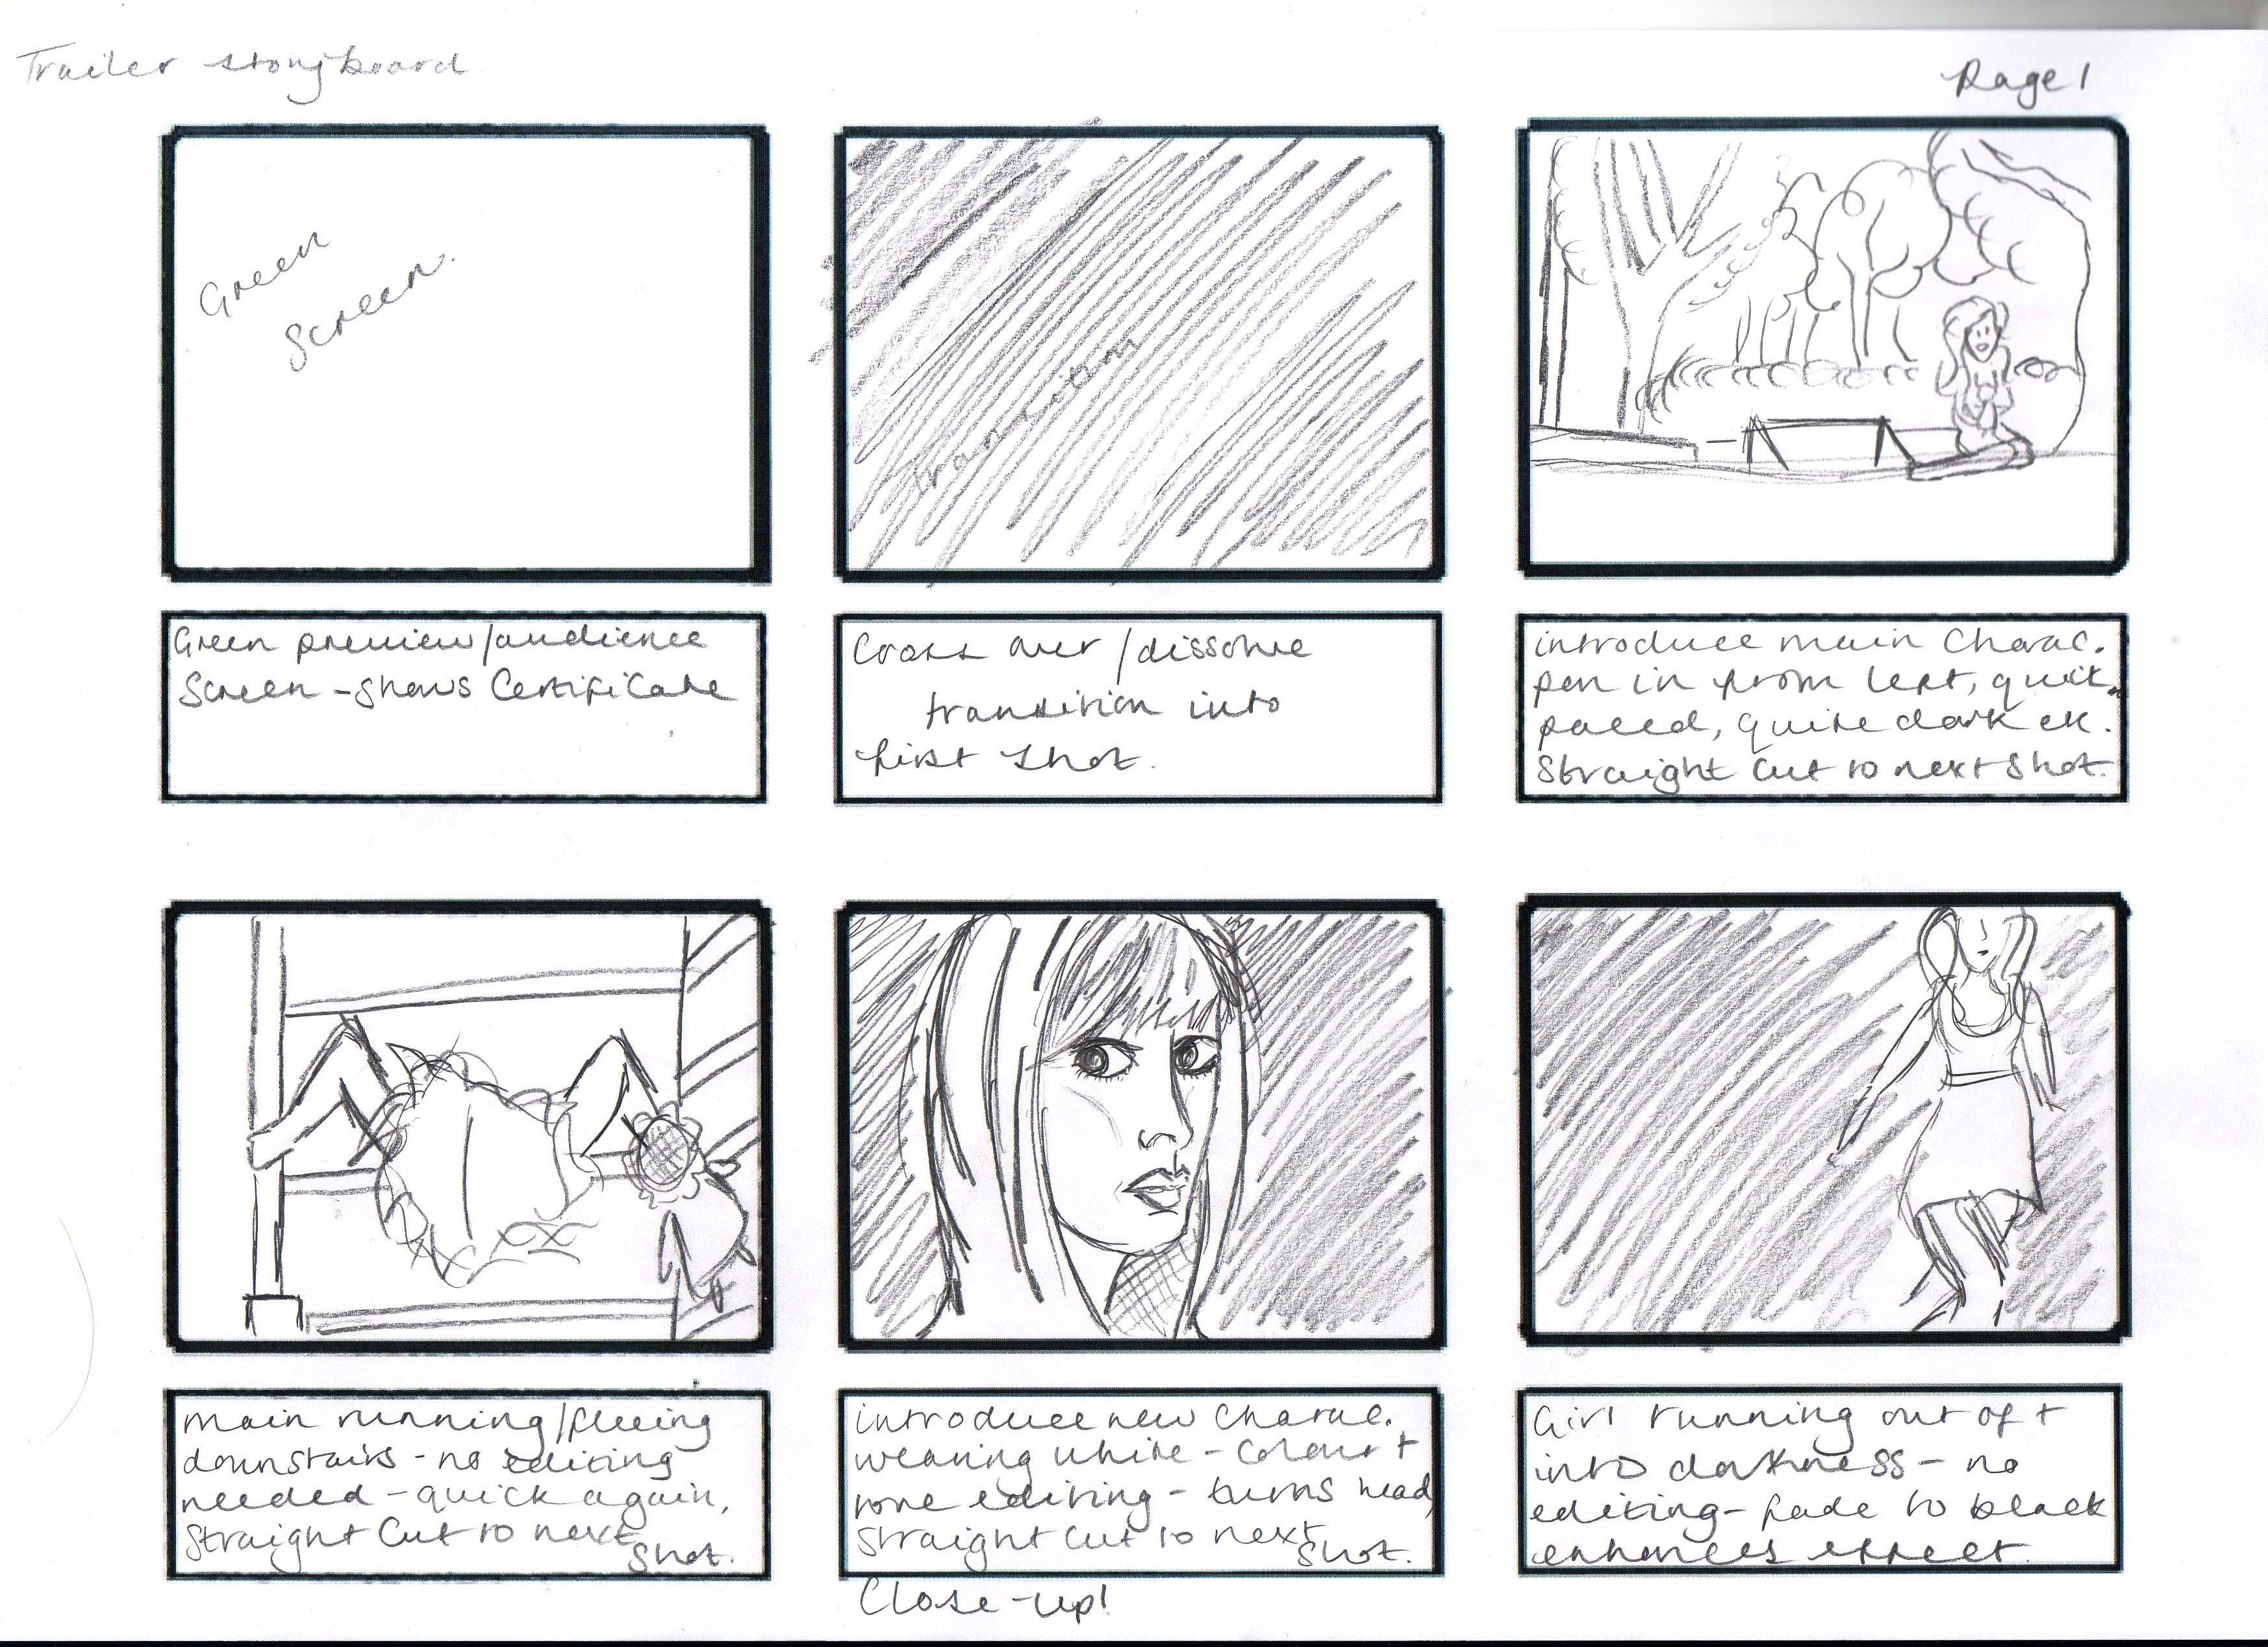 Storyboard For Complete Trailer Mbennettchs S Blog